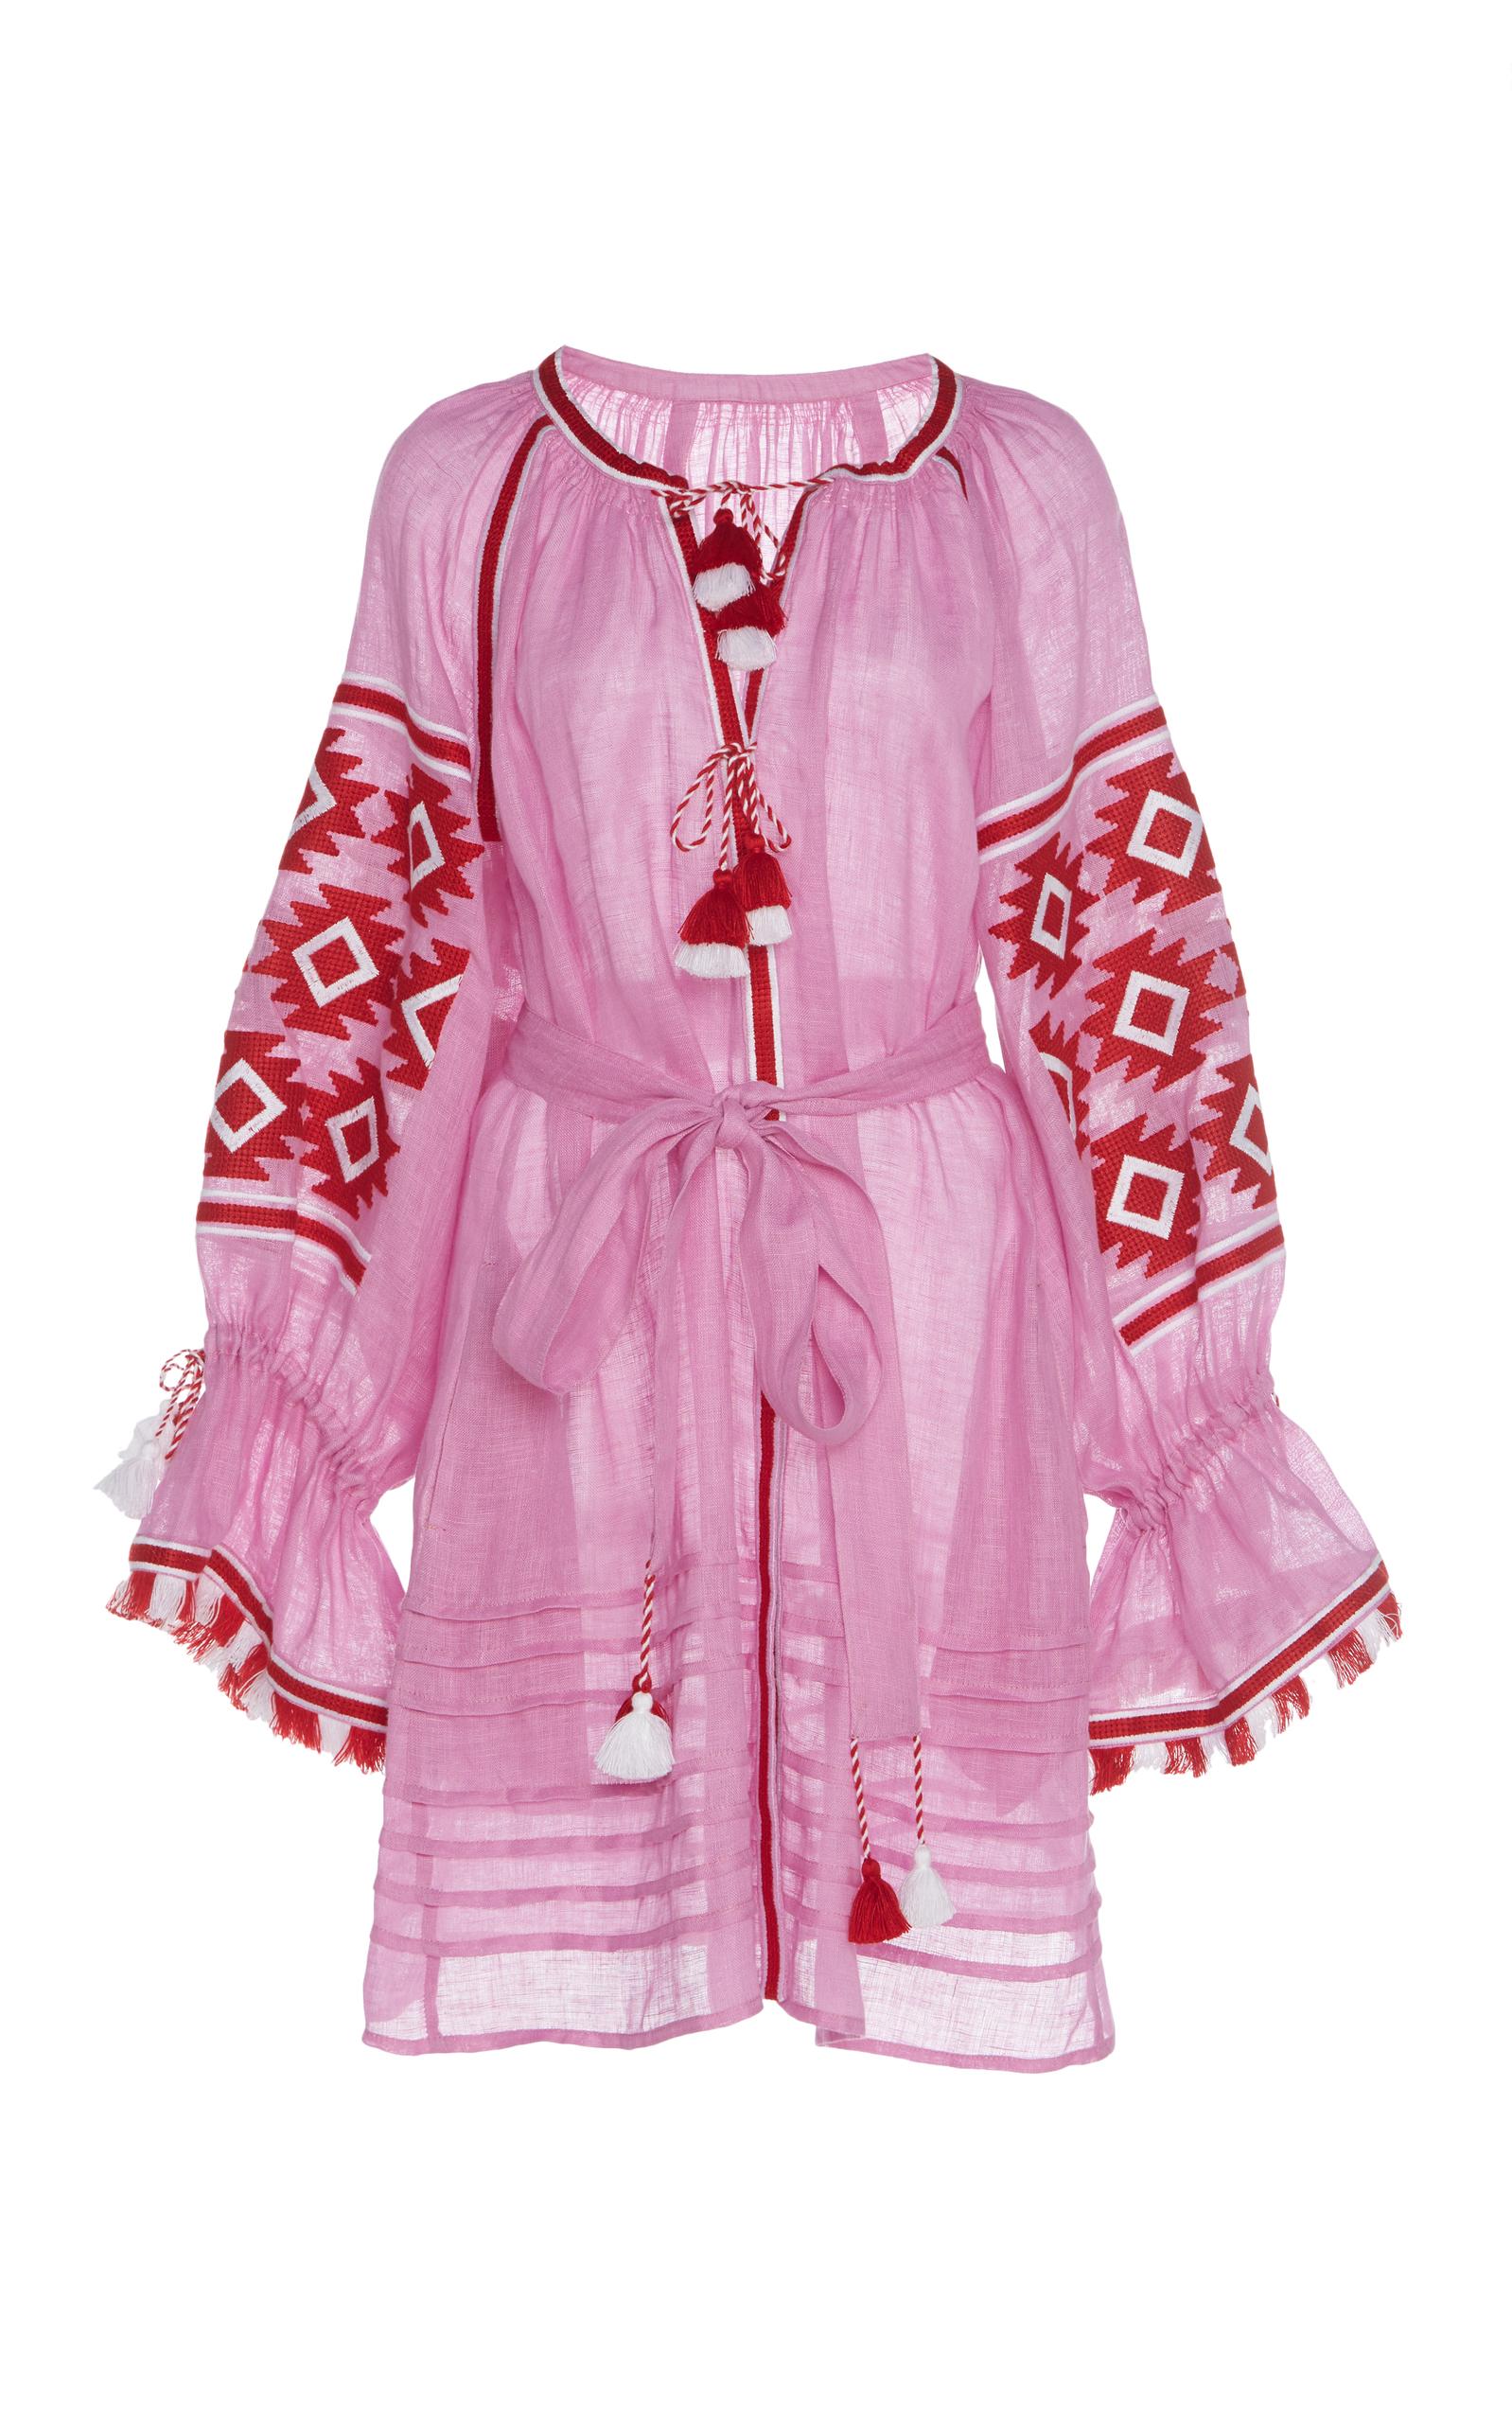 MARCH11 Geometry Mini Dress in Pink